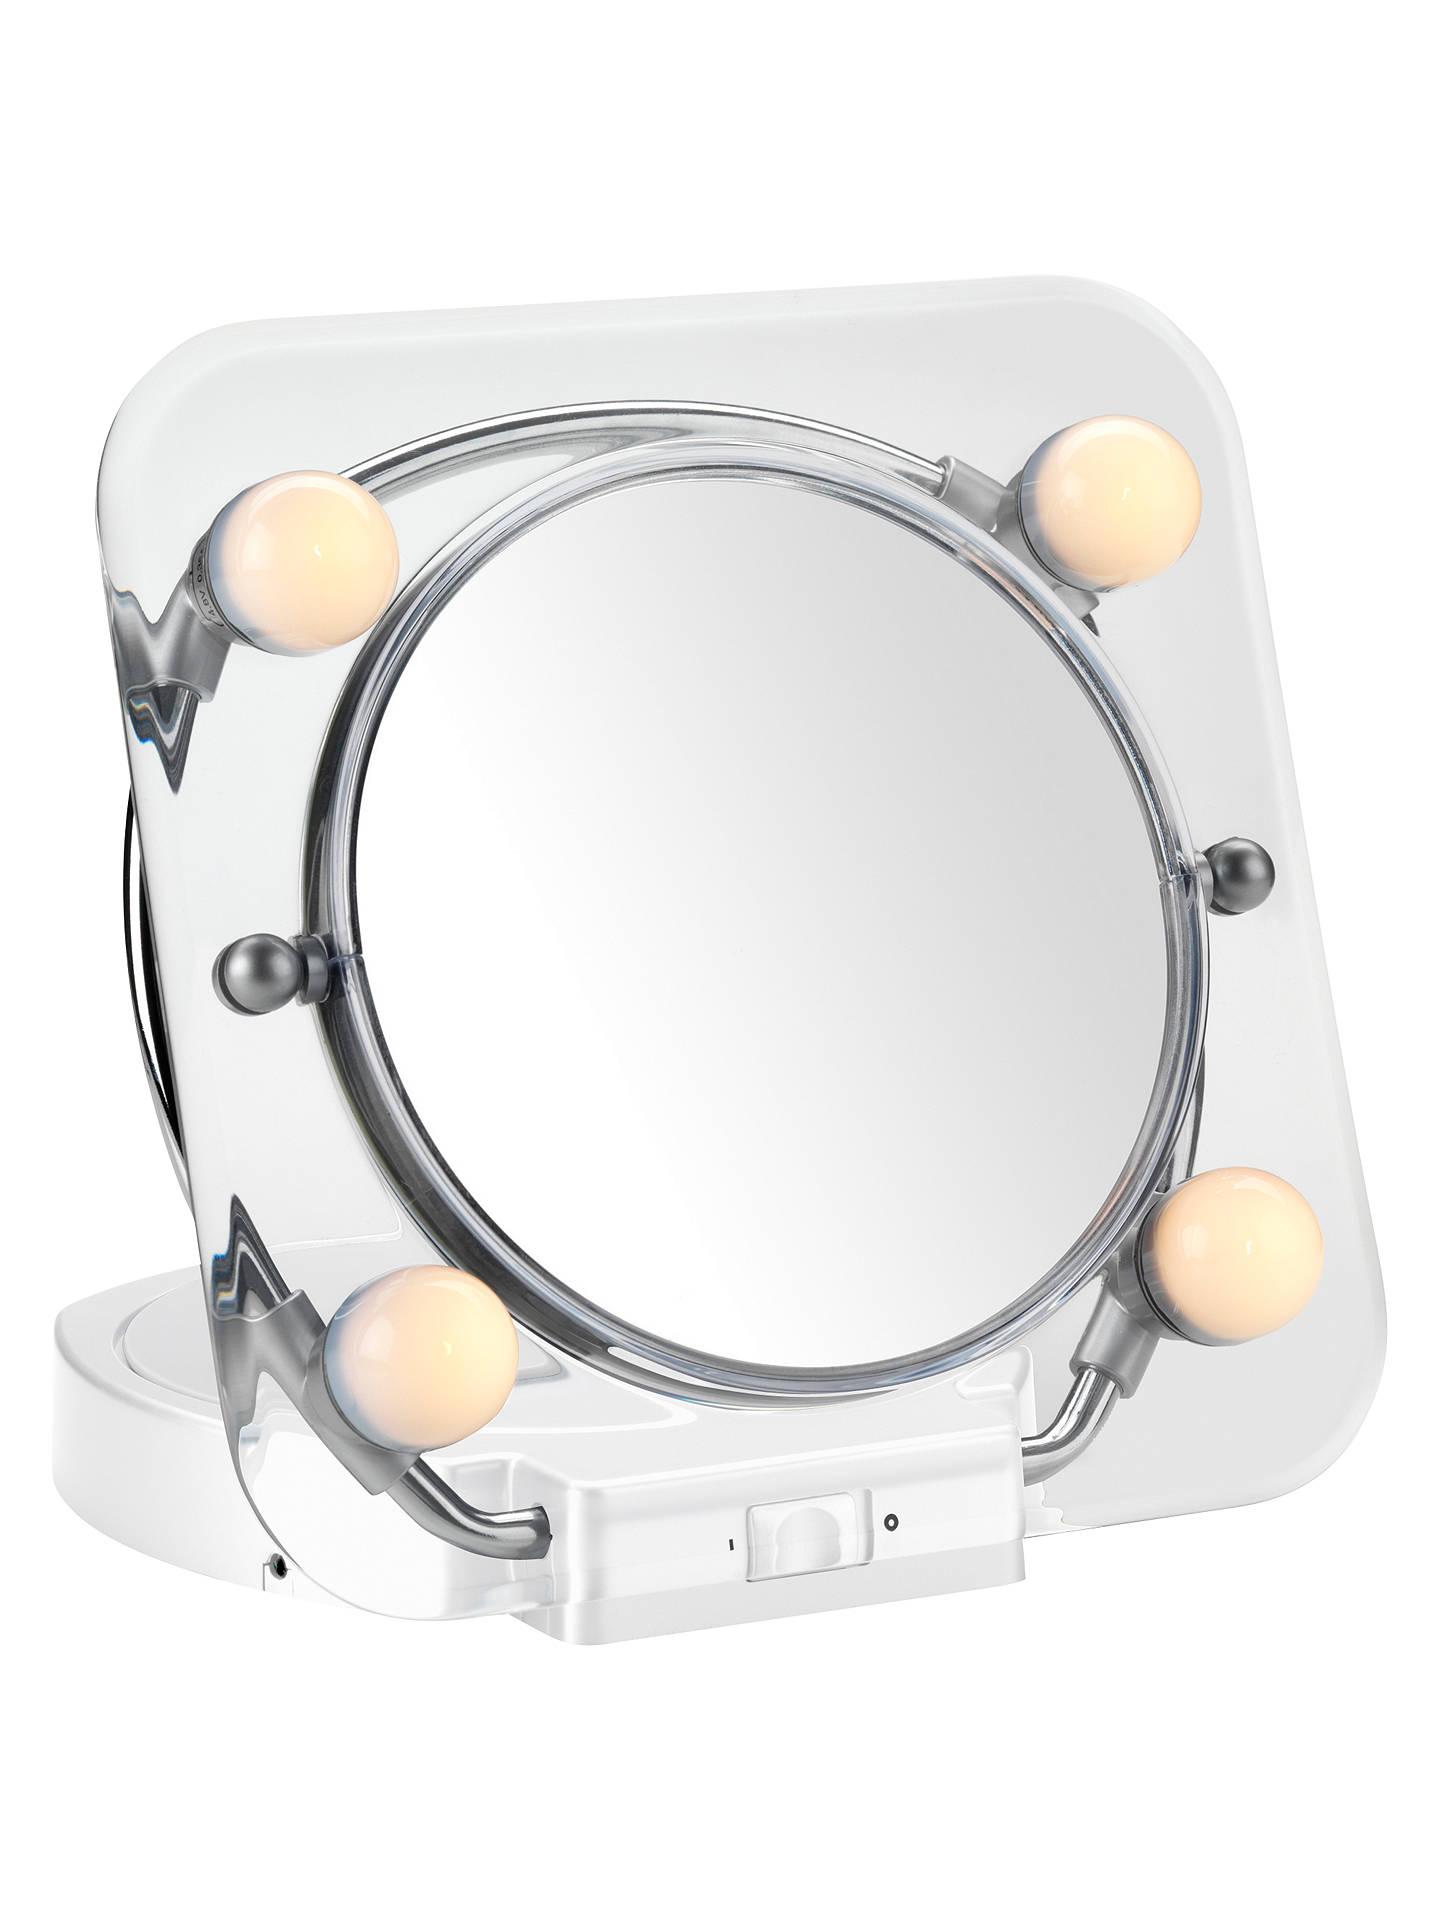 Light Bulb For Revlon Makeup Mirror, How To Replace Bulb In Revlon Makeup Mirror